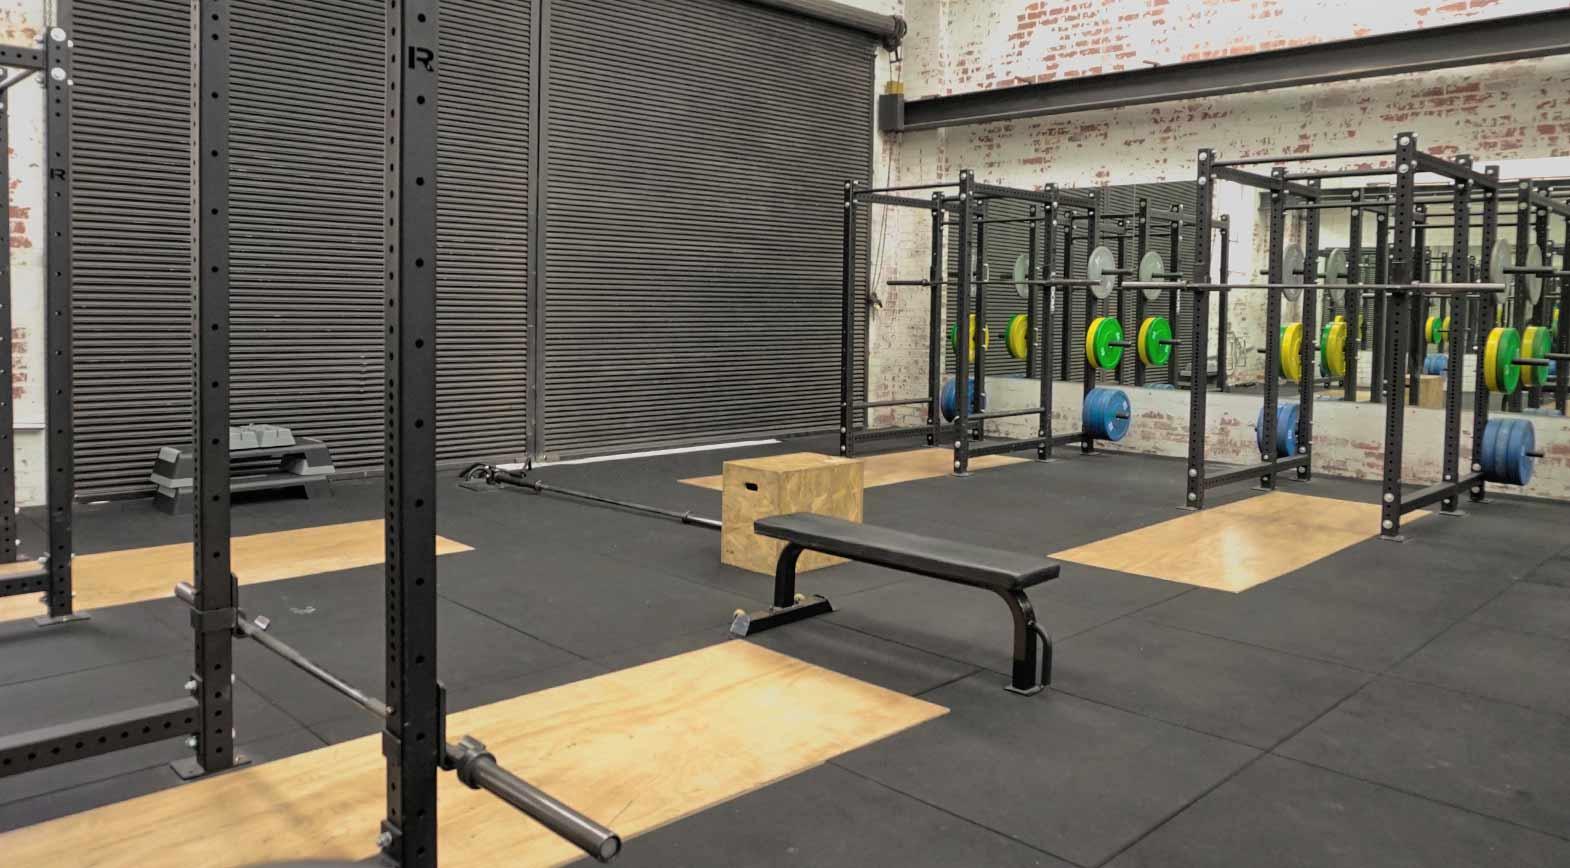 dukes-gym-richmond-squat-racks-lifting-platforms